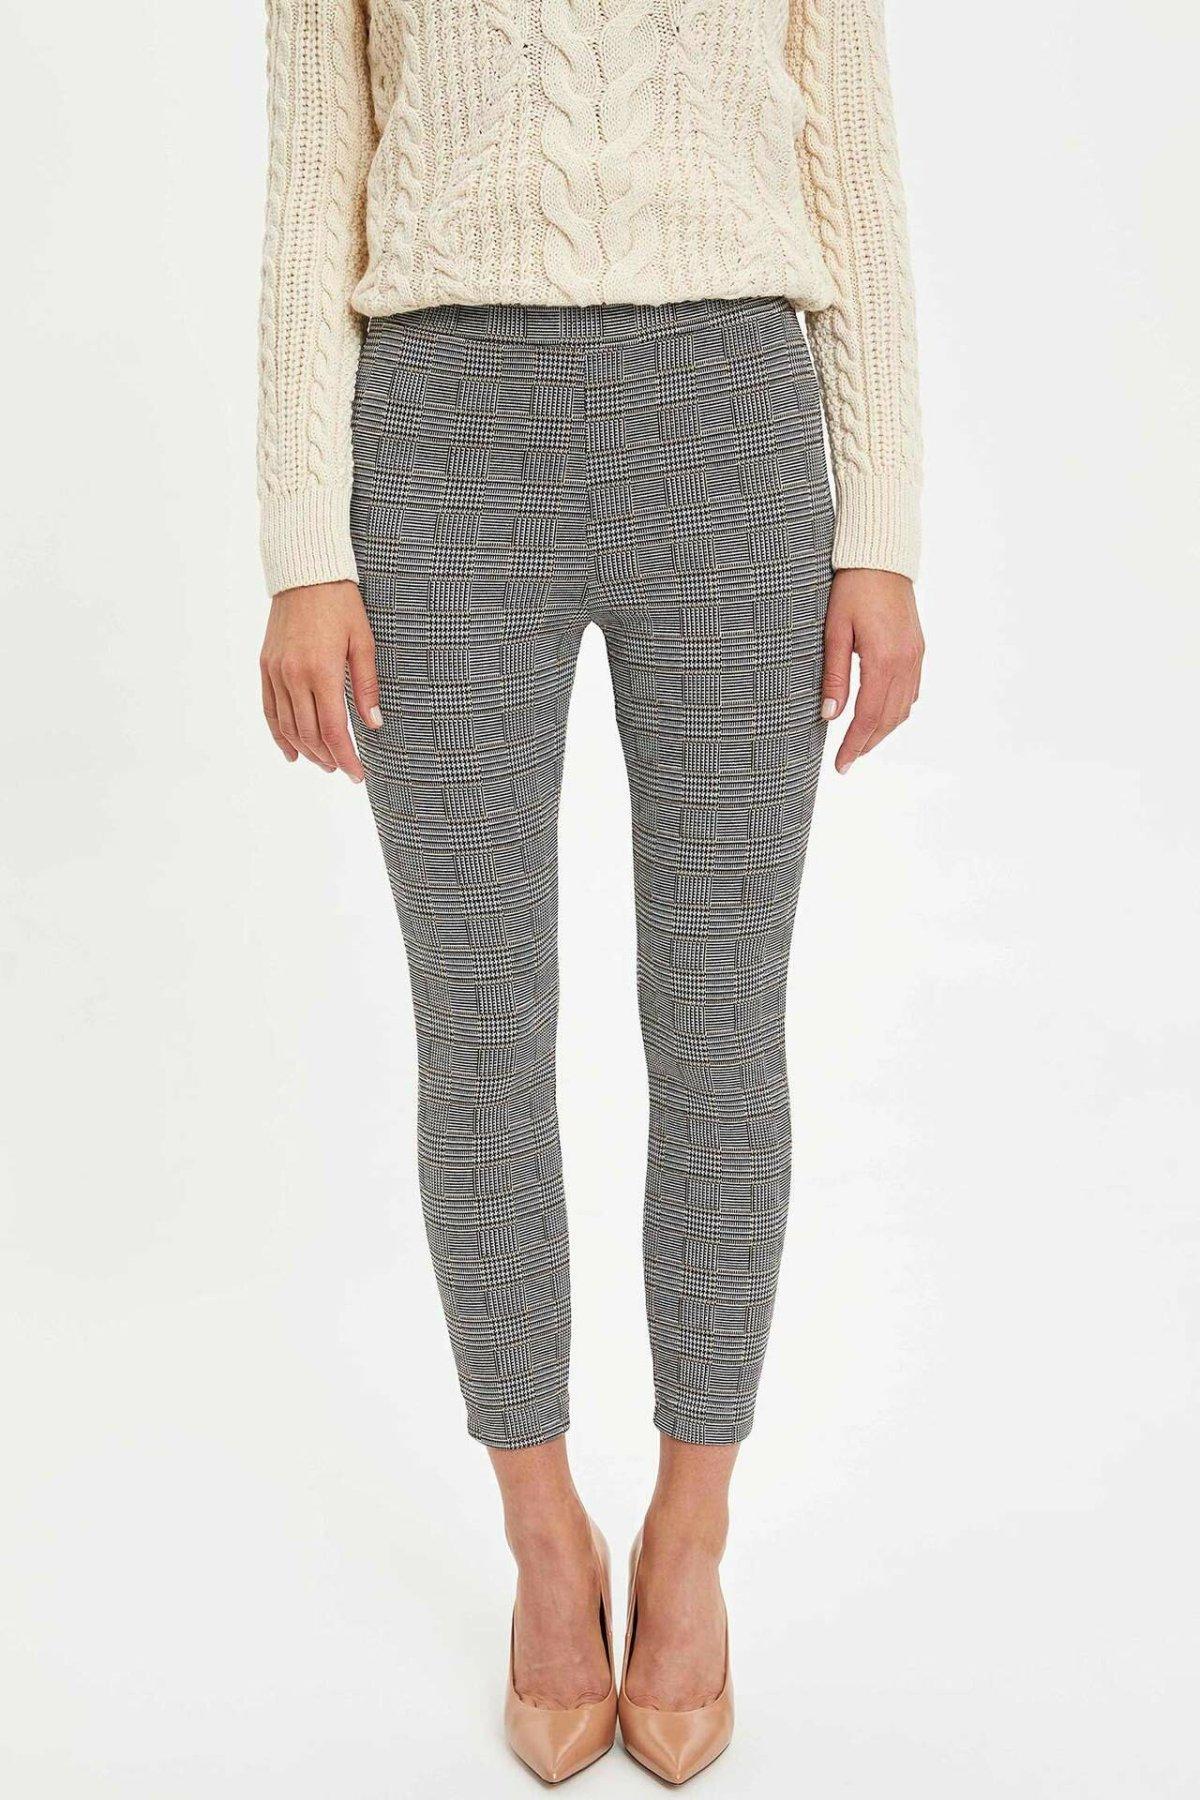 DeFacto Ladies Plaid Pattern Skinny Trousers Women Casual Pants Sweatpants Sport Jogging Leggings Female - M3884AZ19WN